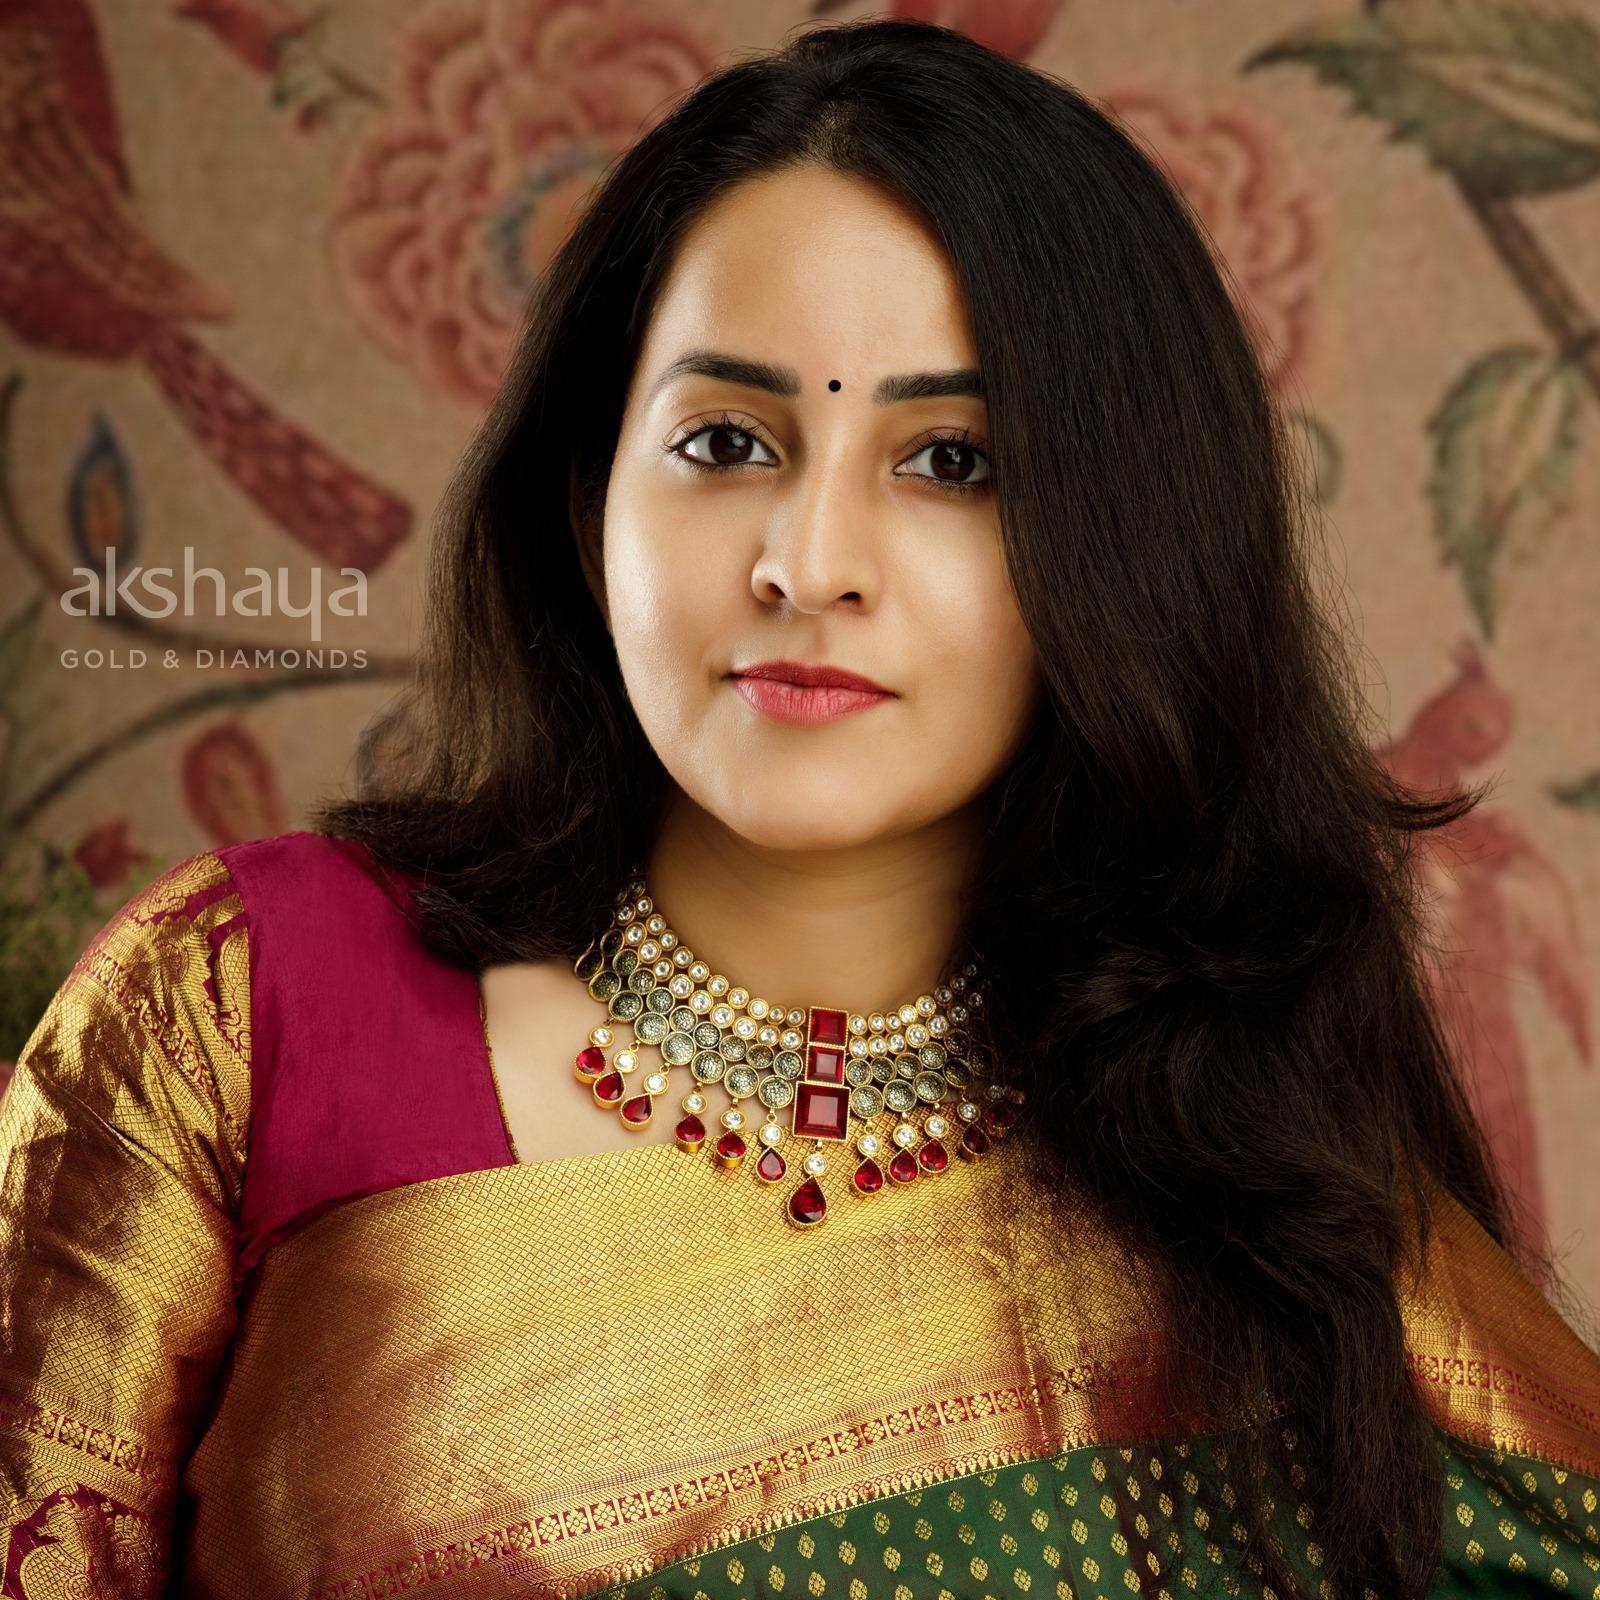 Akshaya Gold Necklace GL10267